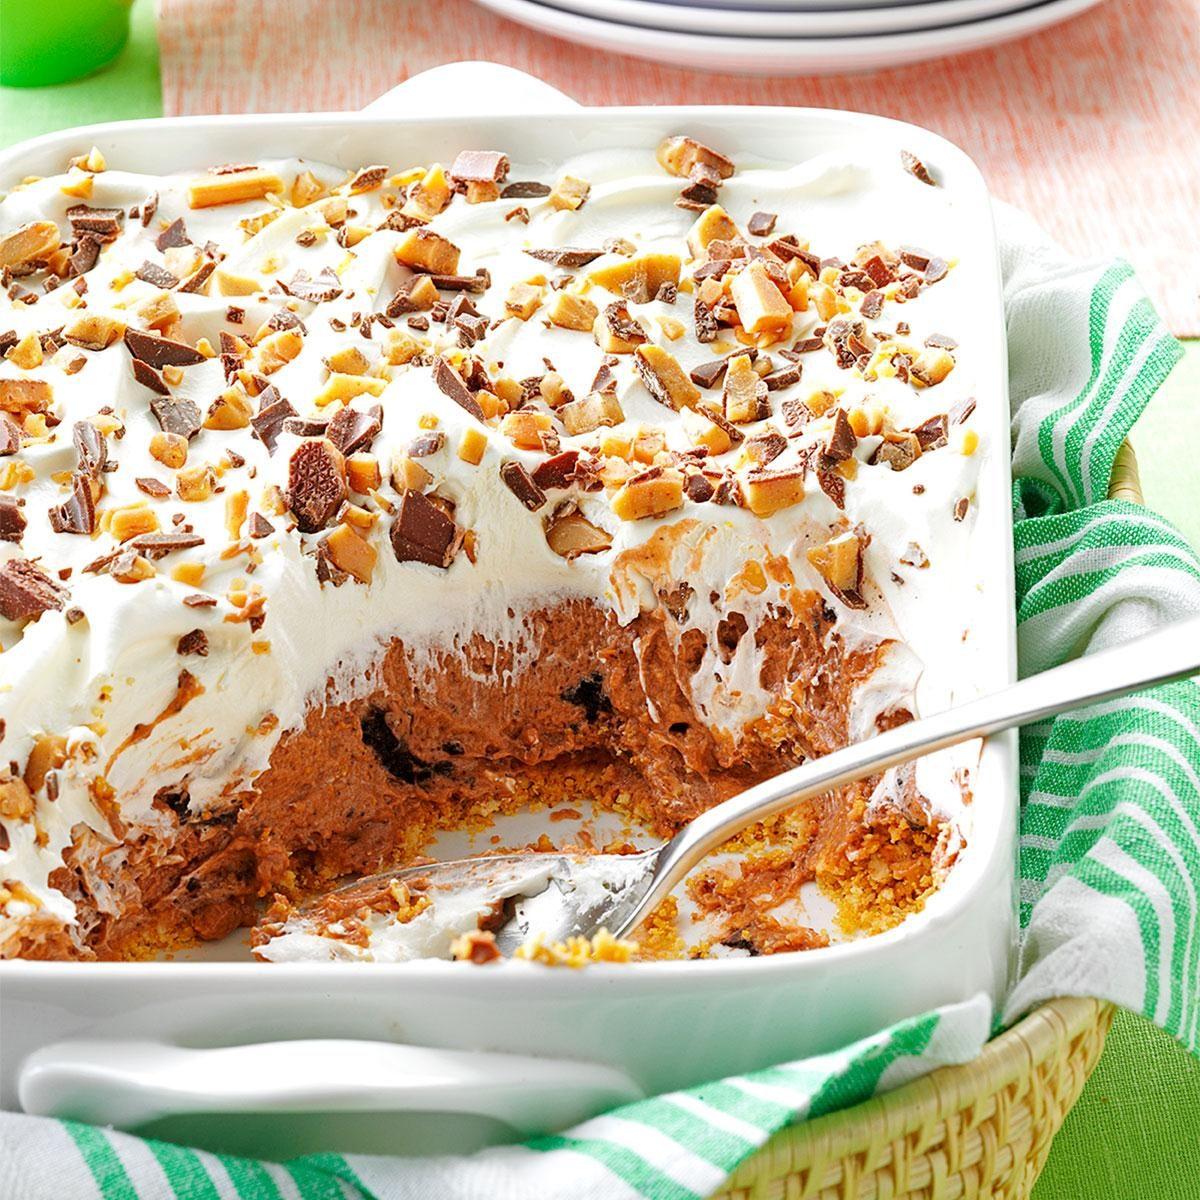 Chocolate Delight Dessert Recipe | Taste of Home